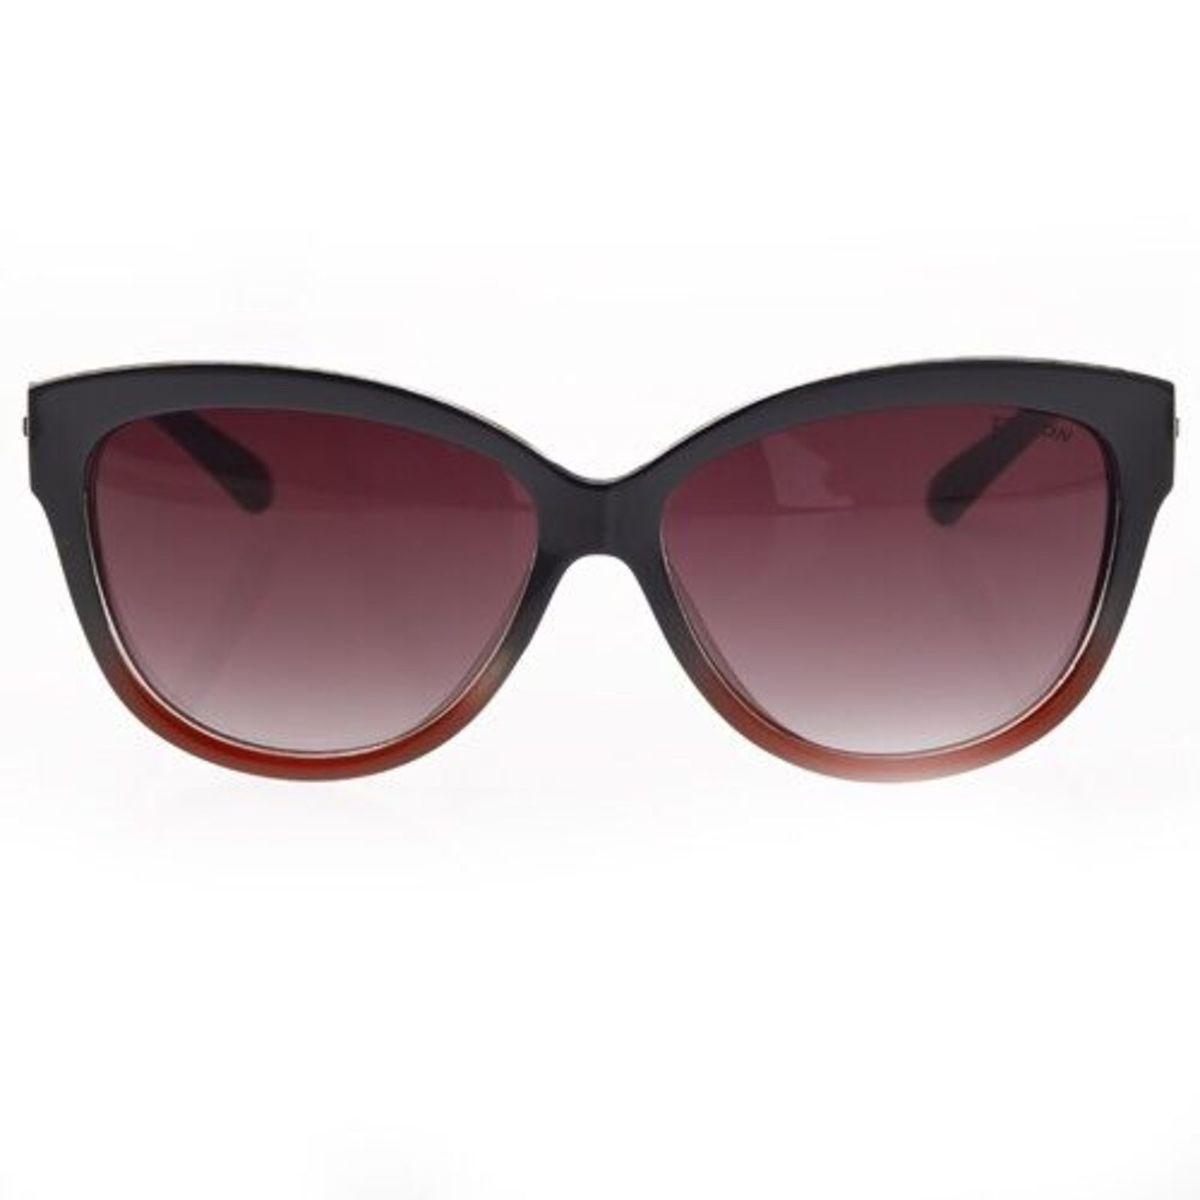 ba9ef1c5c139a óculos - óculos triton eyewear.  Czm6ly9wag90b3muzw5qb2vplmnvbs5ici9wcm9kdwn0cy80mjc3odmvmmnkytvhngqzodhjmdrjodqyngq0mdg4zgexmdiwmjguanbn